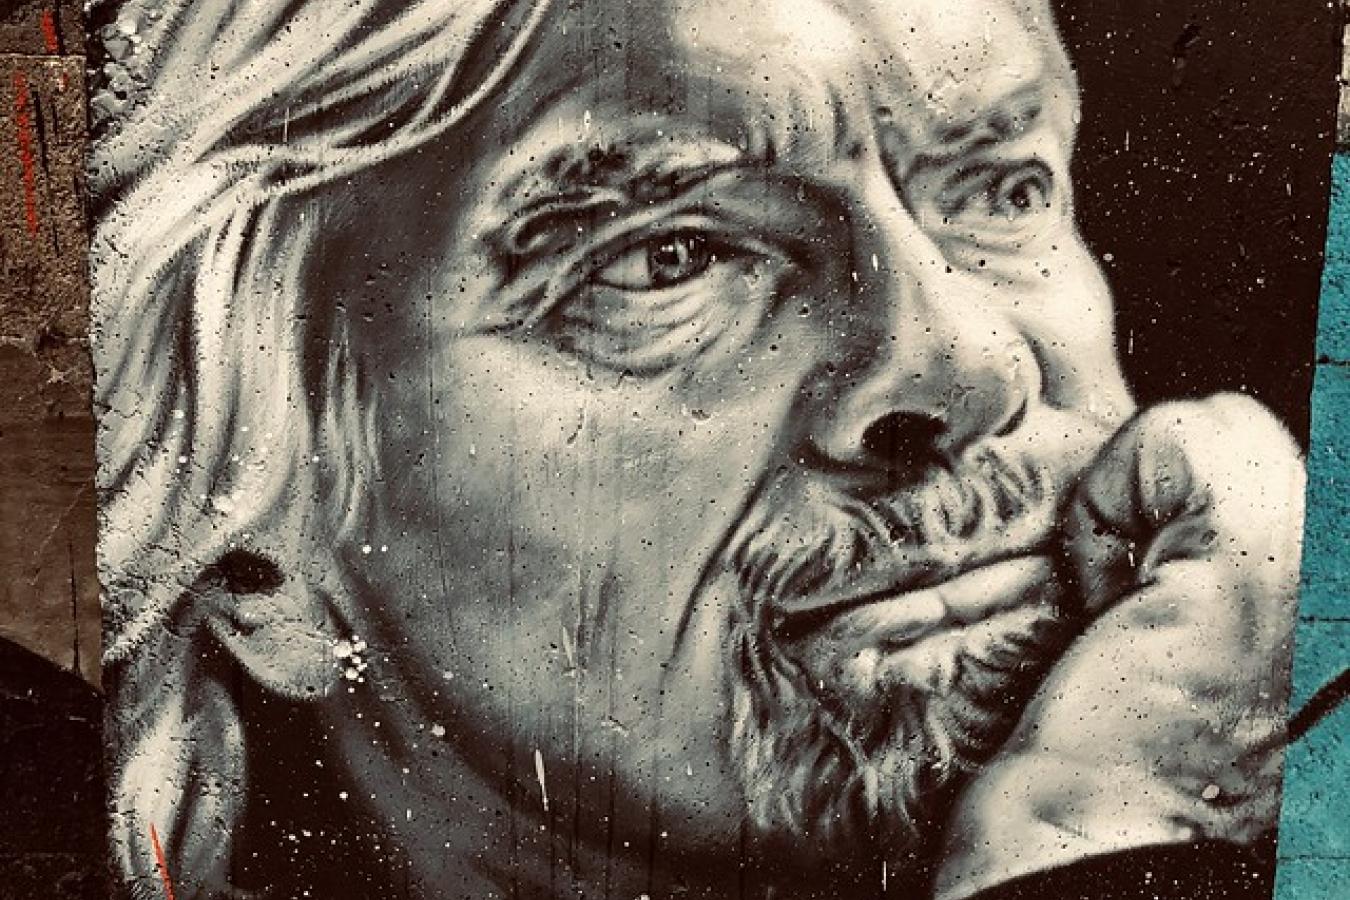 Richard Branson - painted portrait - founder Virgin Media